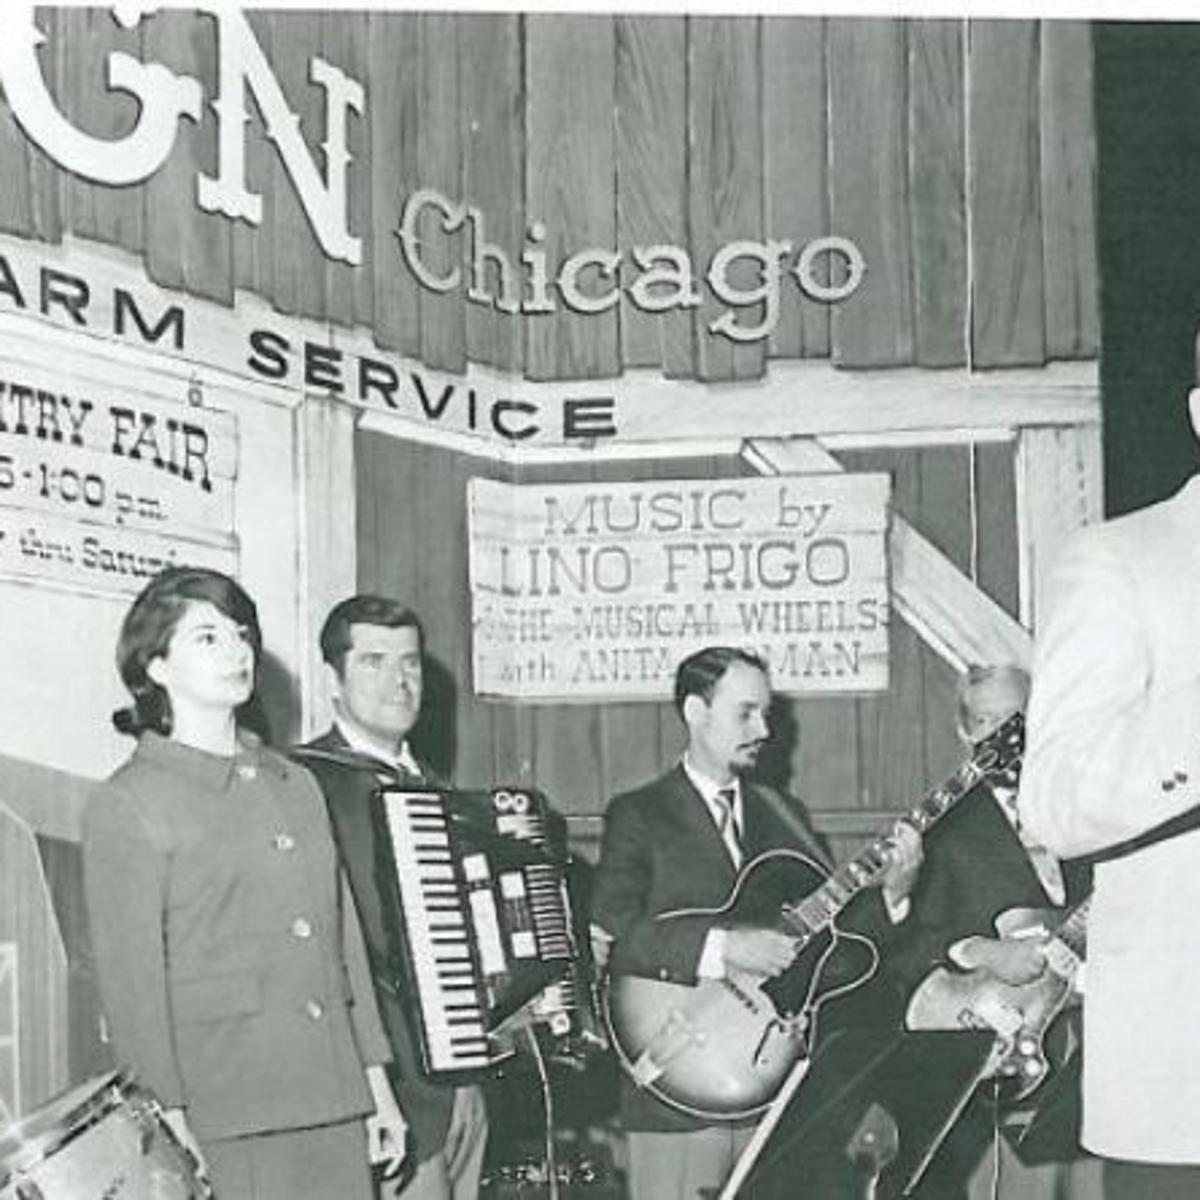 FROM the FARM: WGN Radio celebrates 90 years as farmer